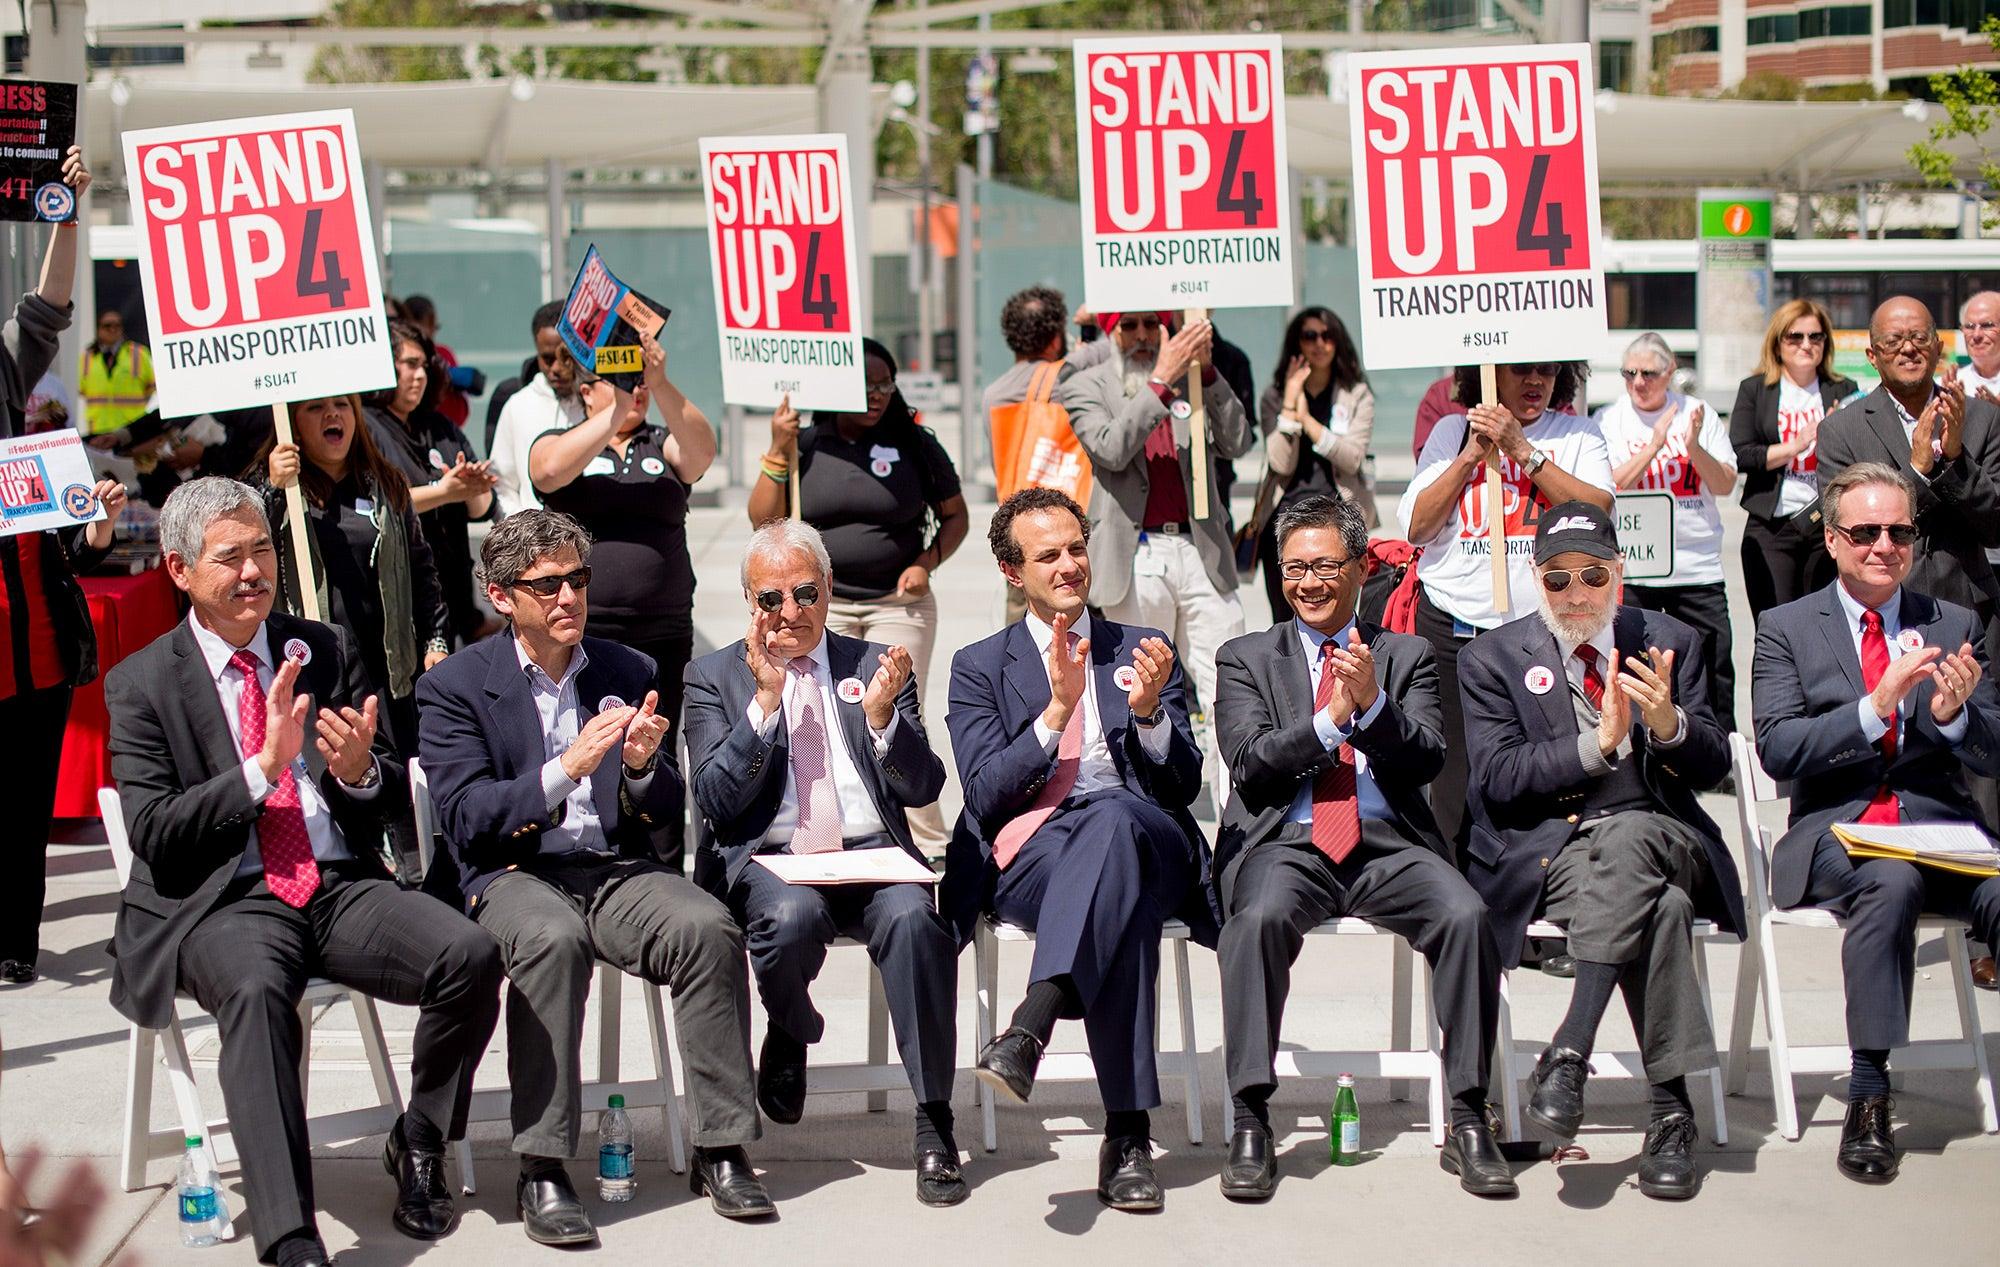 Group photo of SU4T speakers